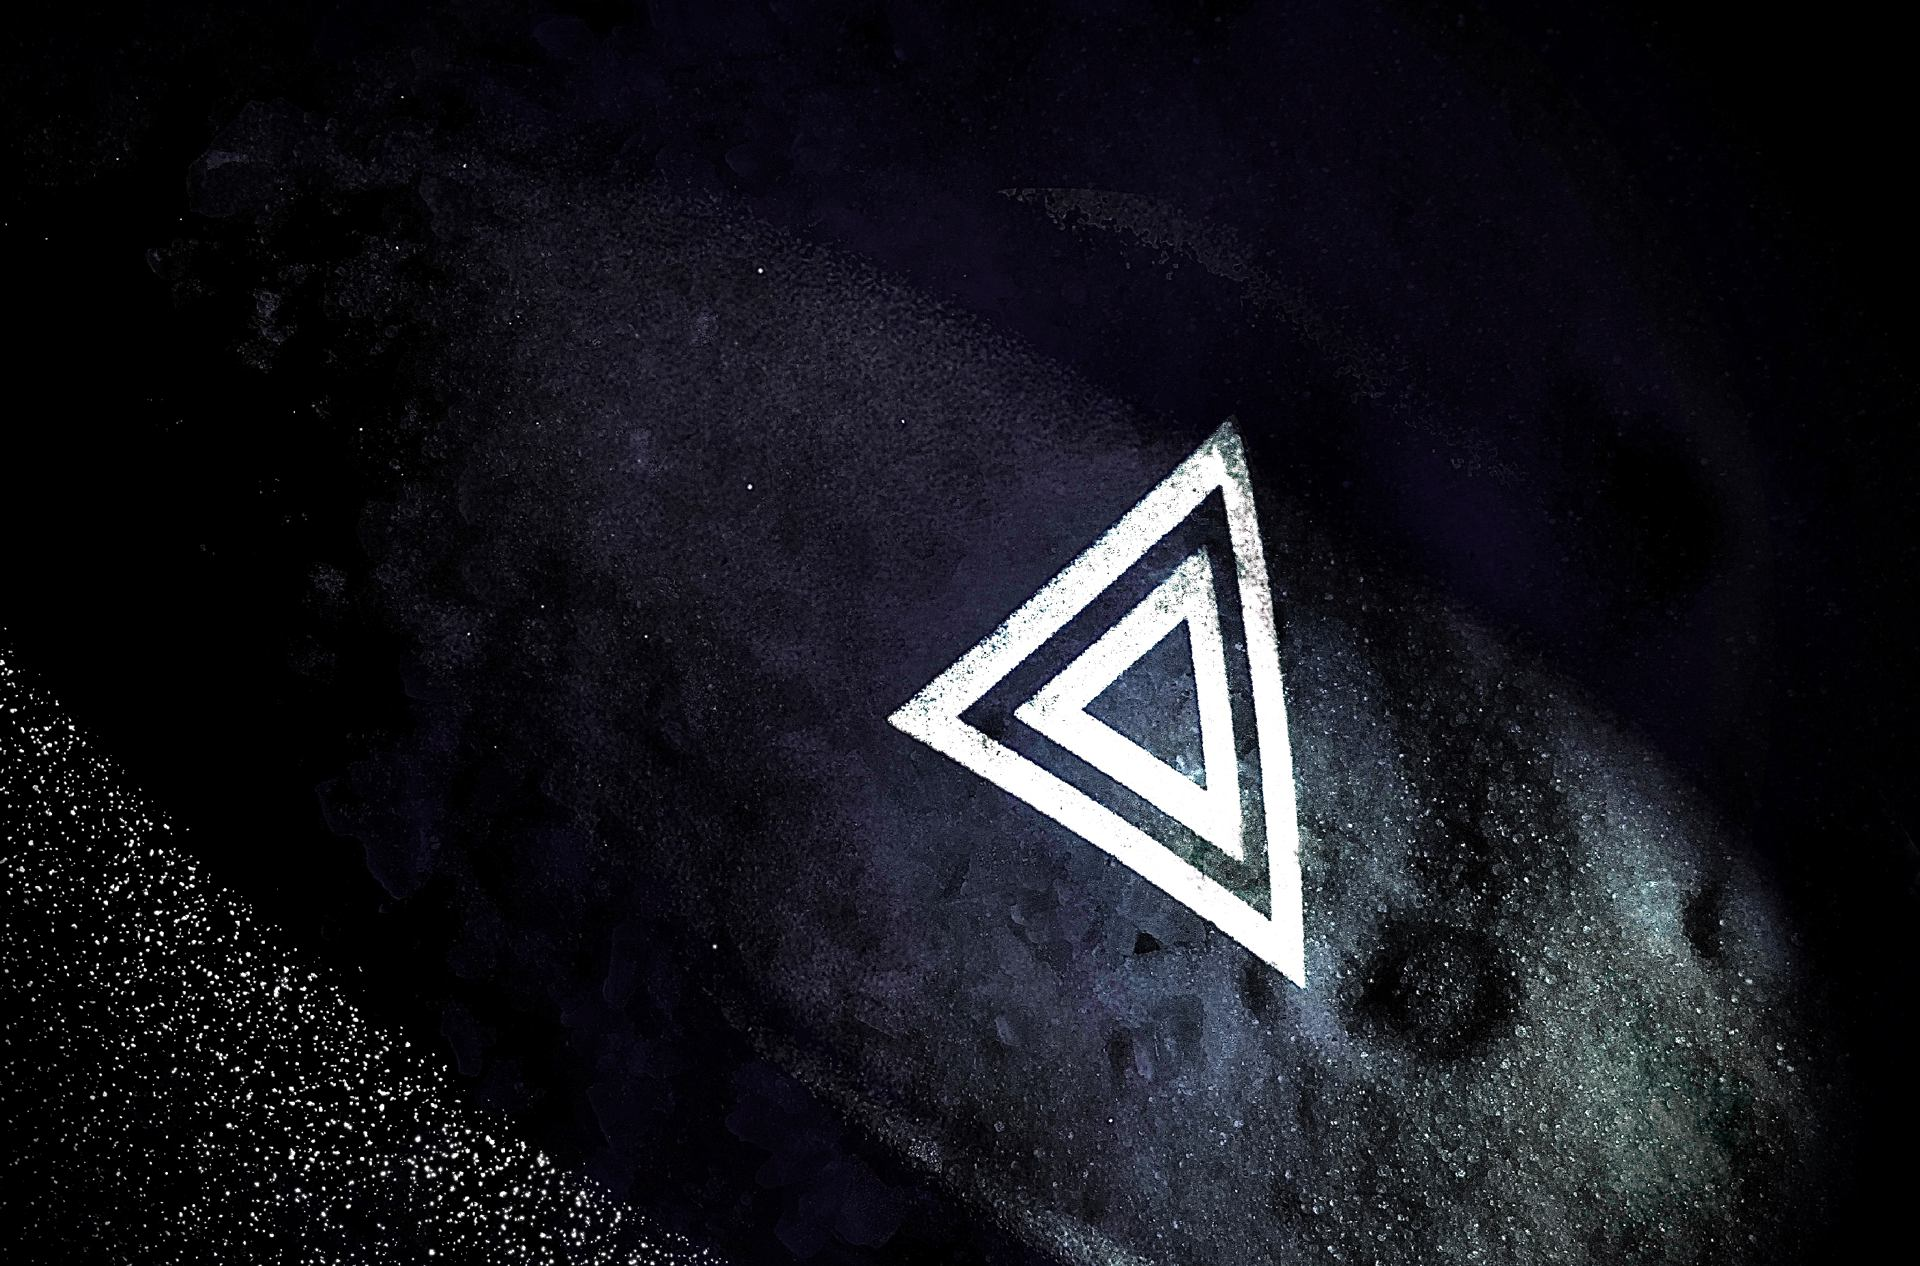 La constellation du triangle.